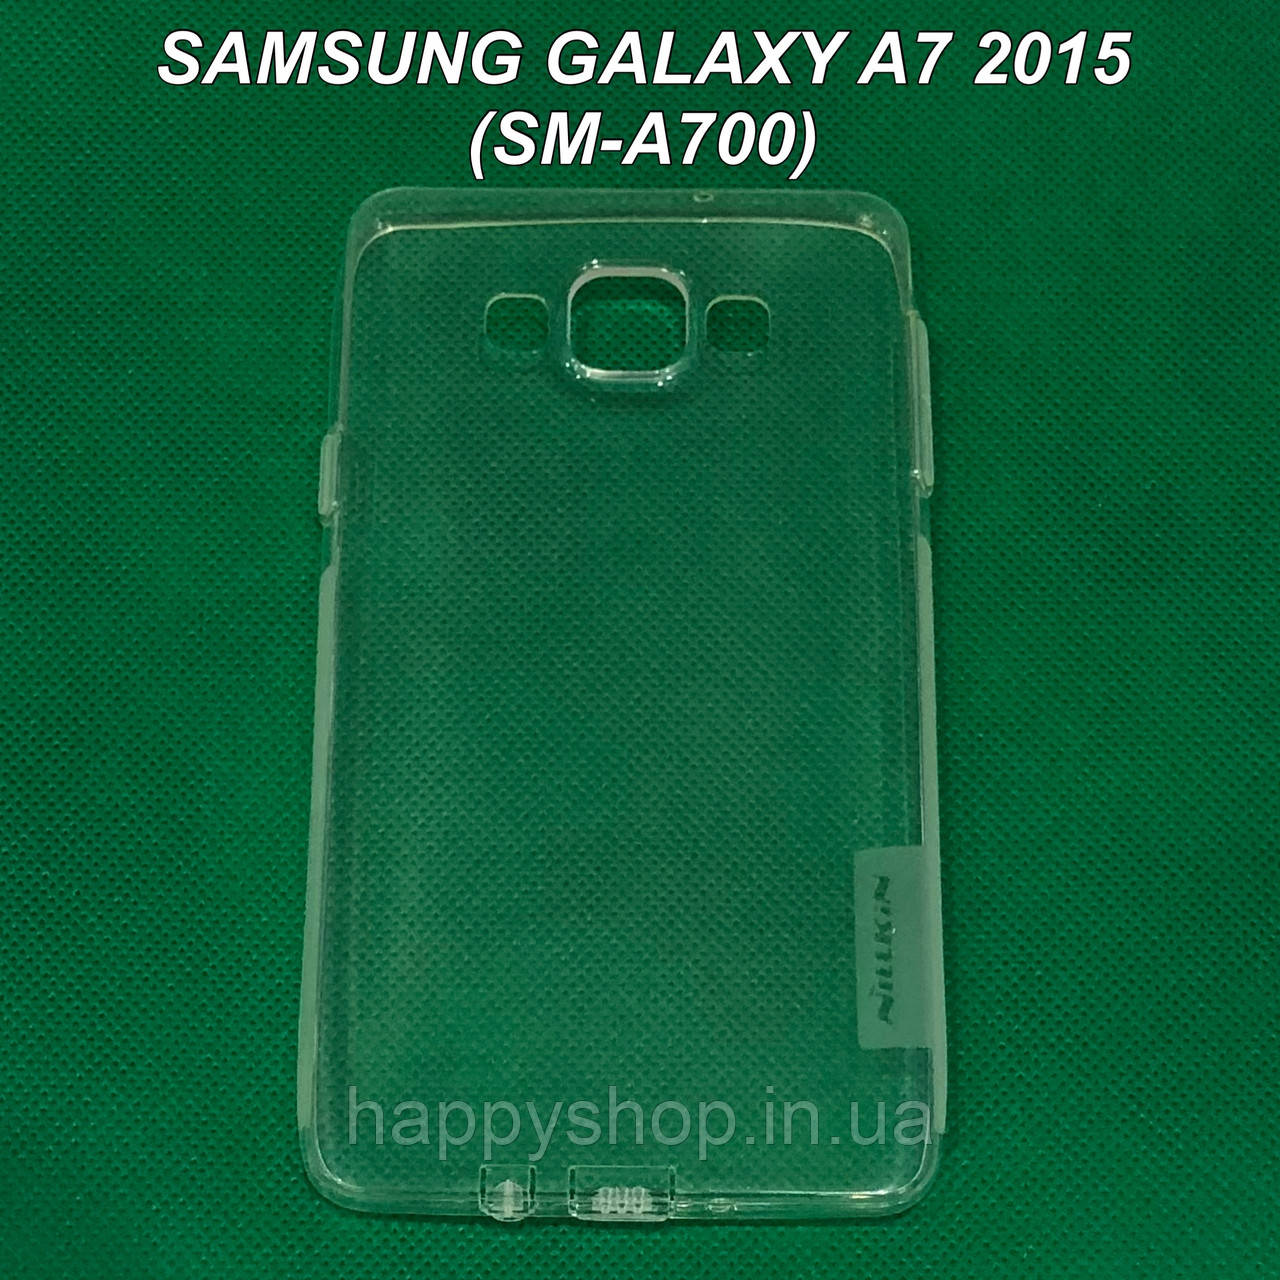 Прозрачный силиконовый чехол Nillkin для Samsung Galaxy A7 2015 (SM-A700)